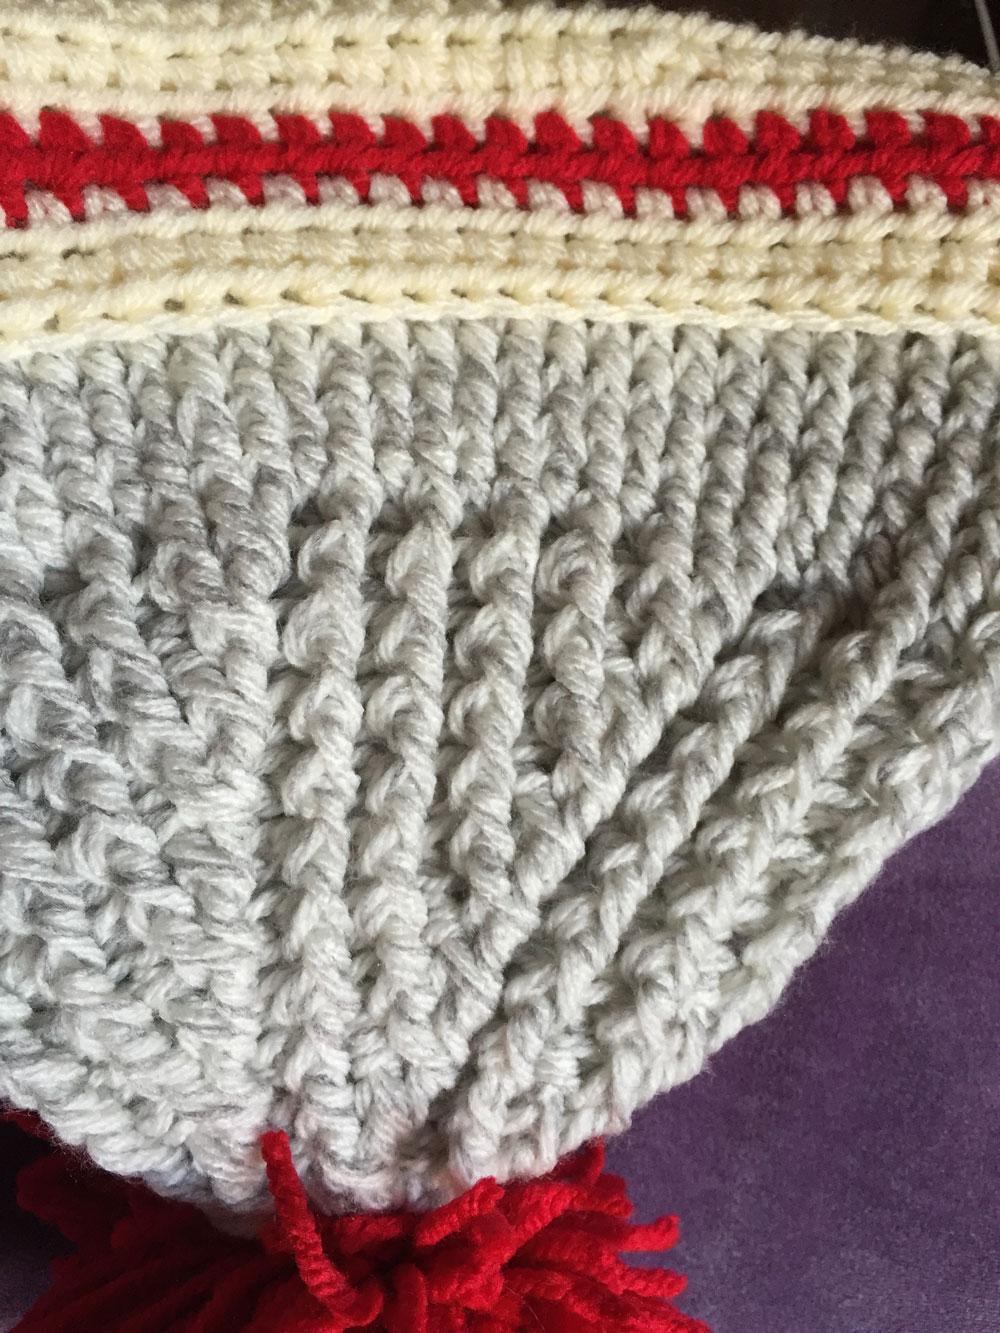 14ca379683d Crochet Sock Hats - All Sizes + Tutorial